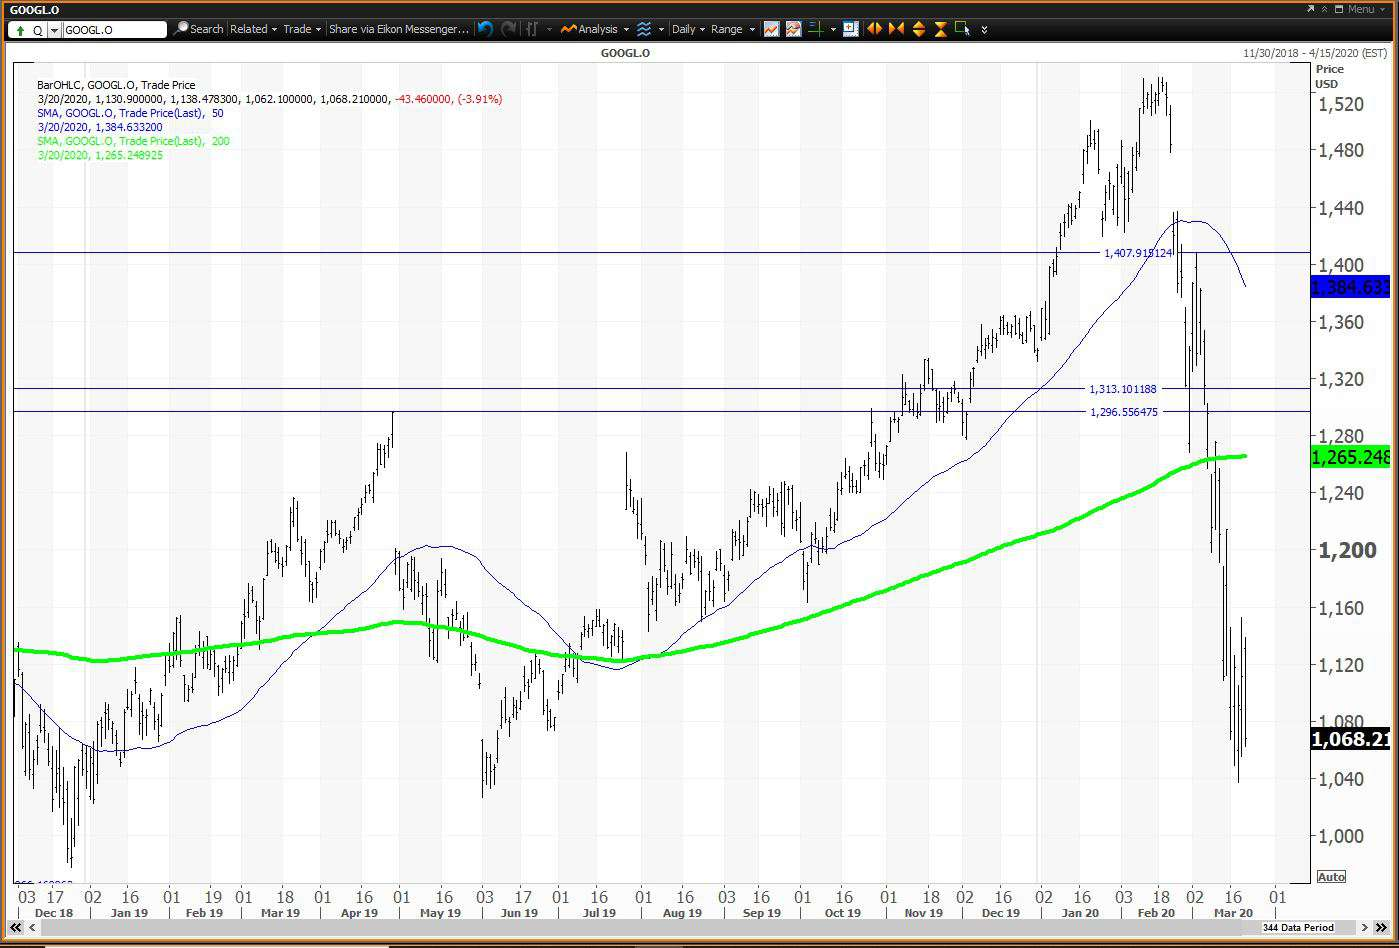 Alphabet Stock Crashes Into Bear Market Territory